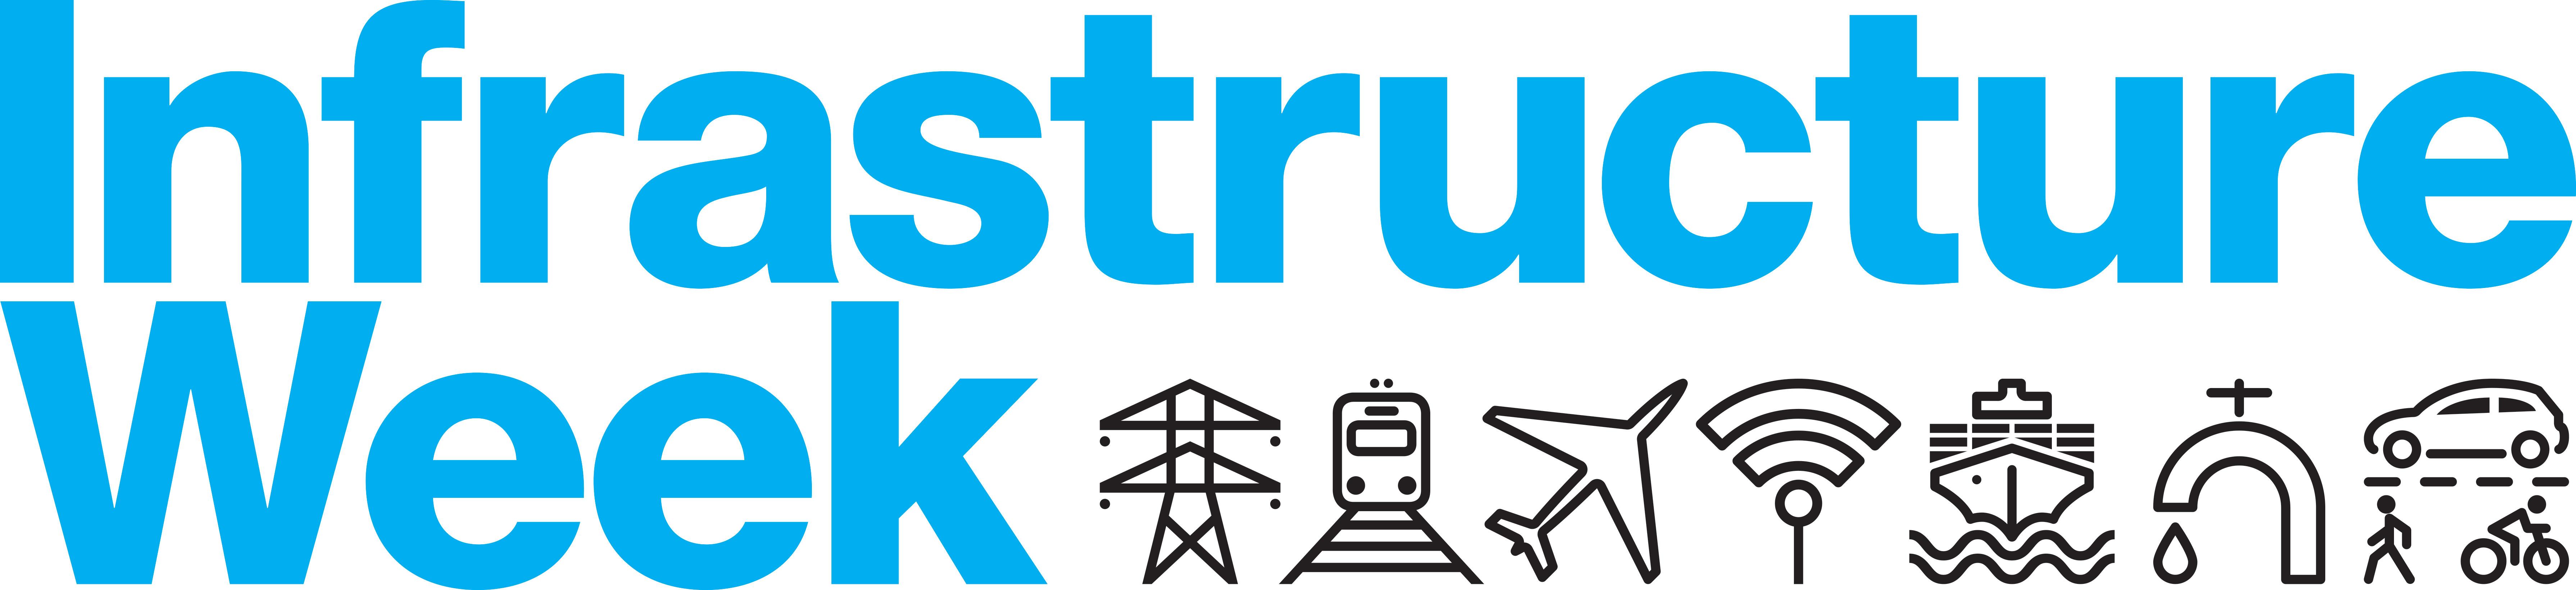 Infrastructure Week